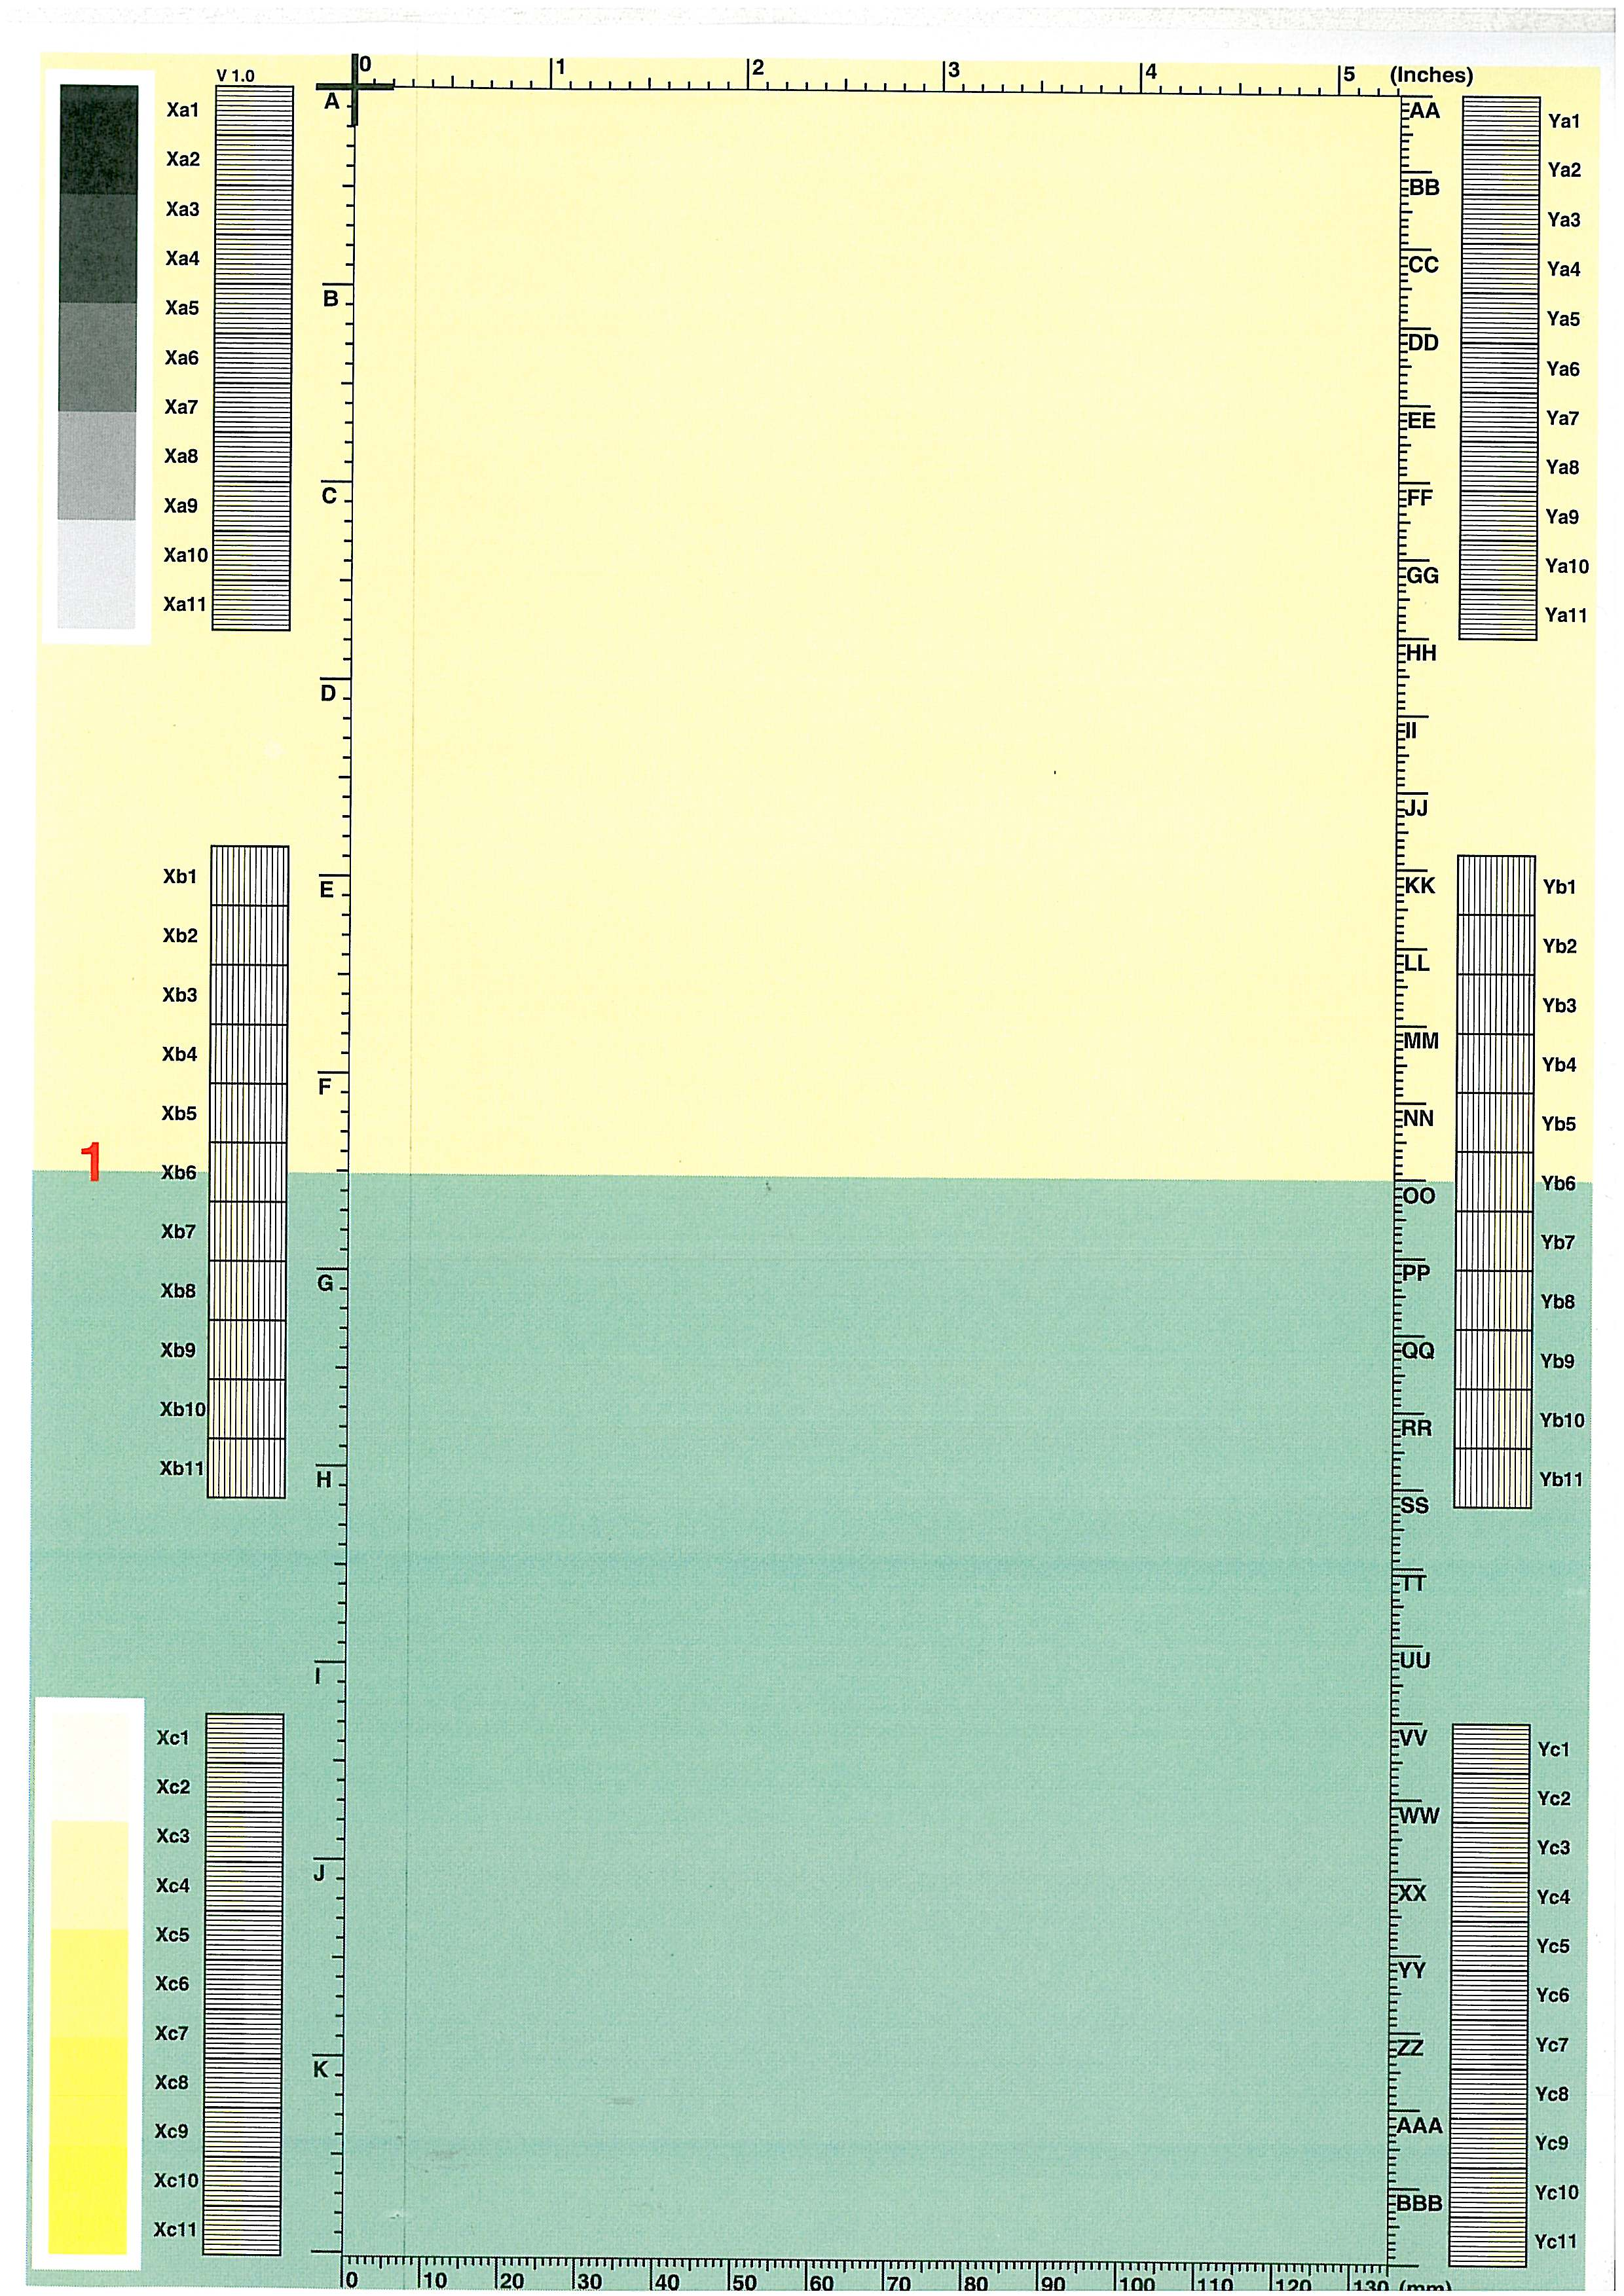 HP 3525 - poziomy pasek na wydruku